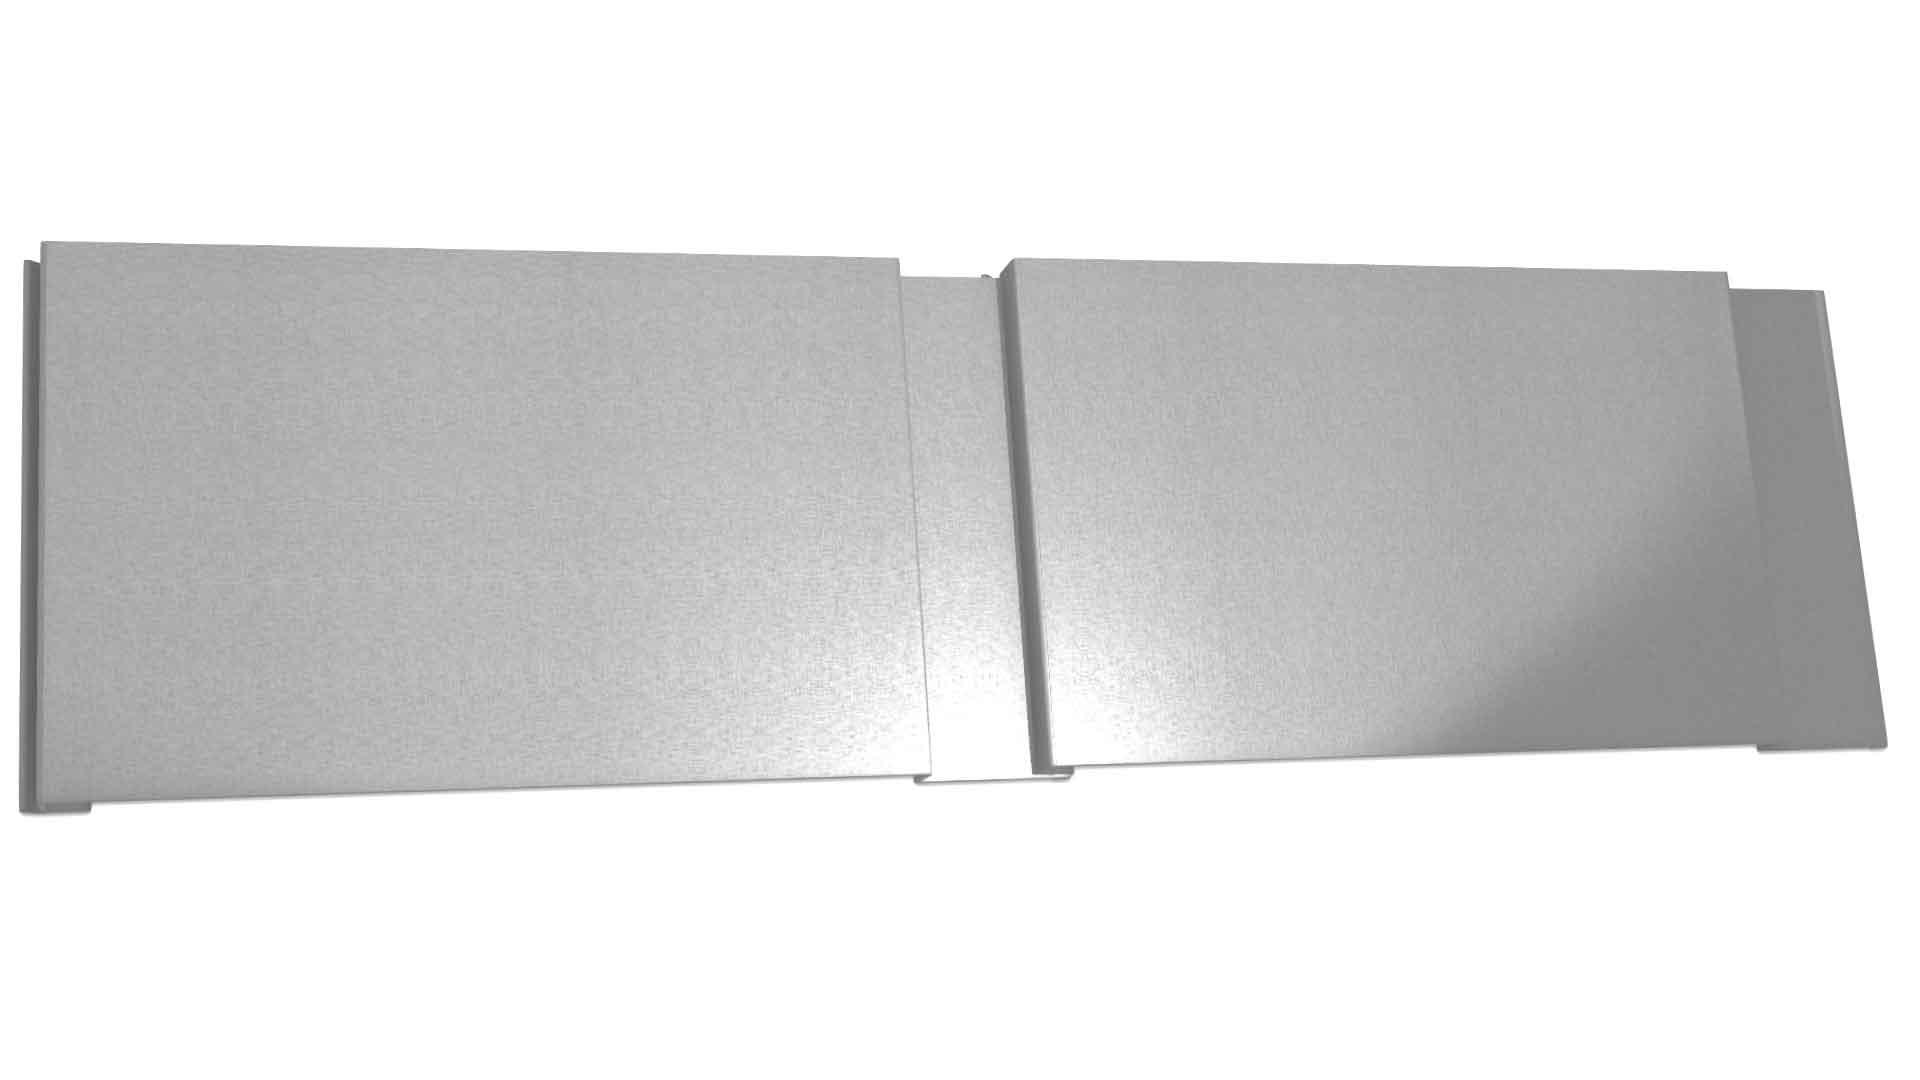 https://f.hubspotusercontent30.net/hubfs/6069238/images/galleries/galvalume-az50/galvalume-western-reveal-two-panels.jpg